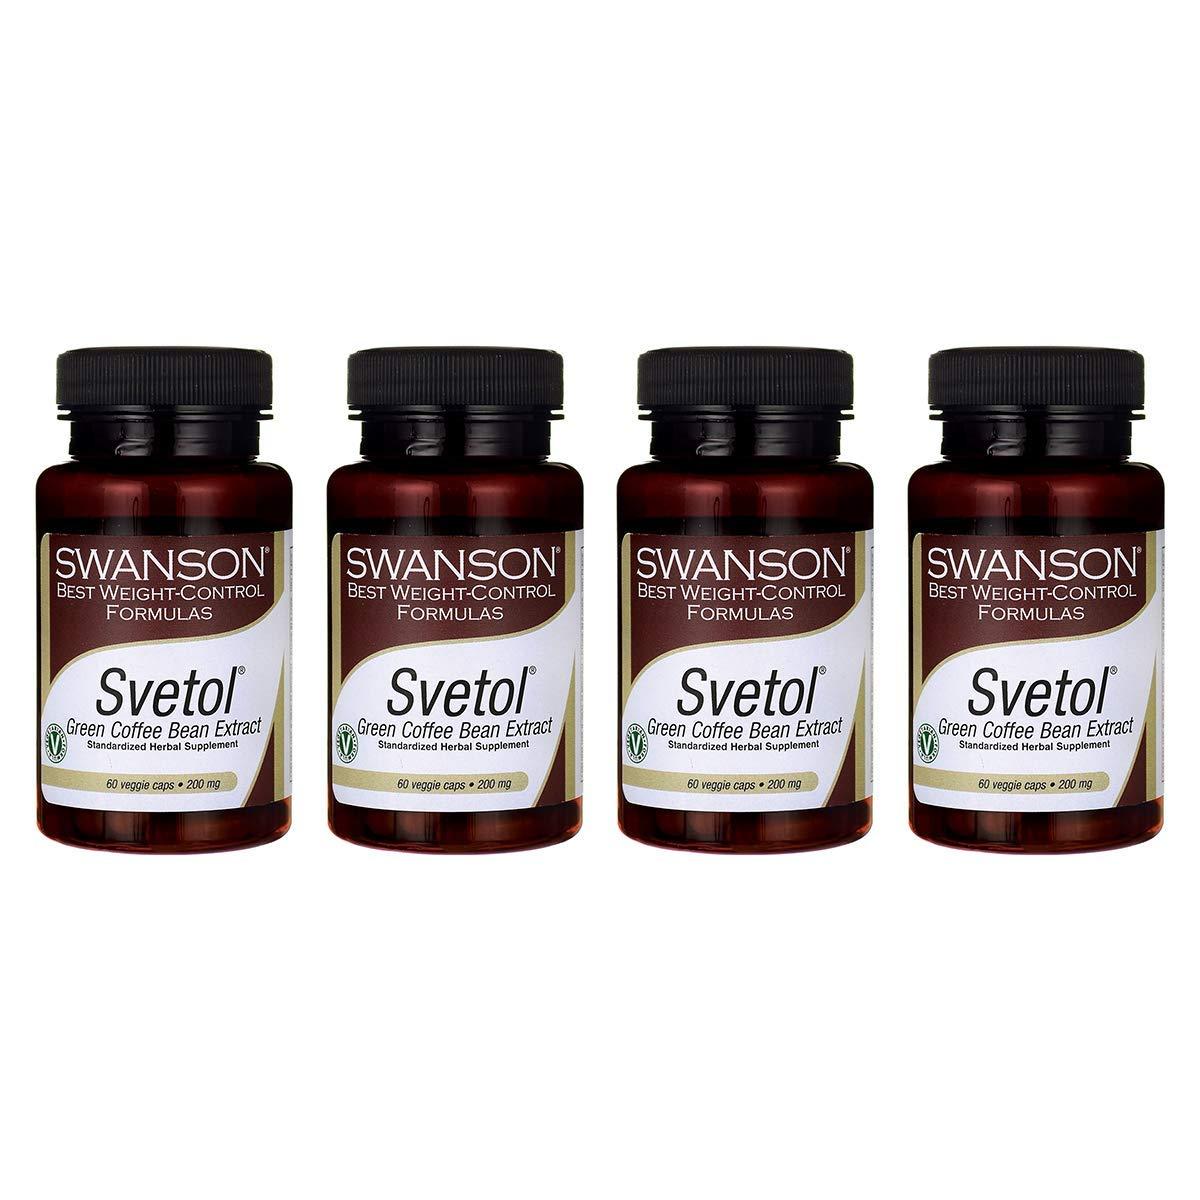 Swanson Svetol Green Coffee Bean Extract 200 Milligrams 60 Veg Capsules (4 Pack)